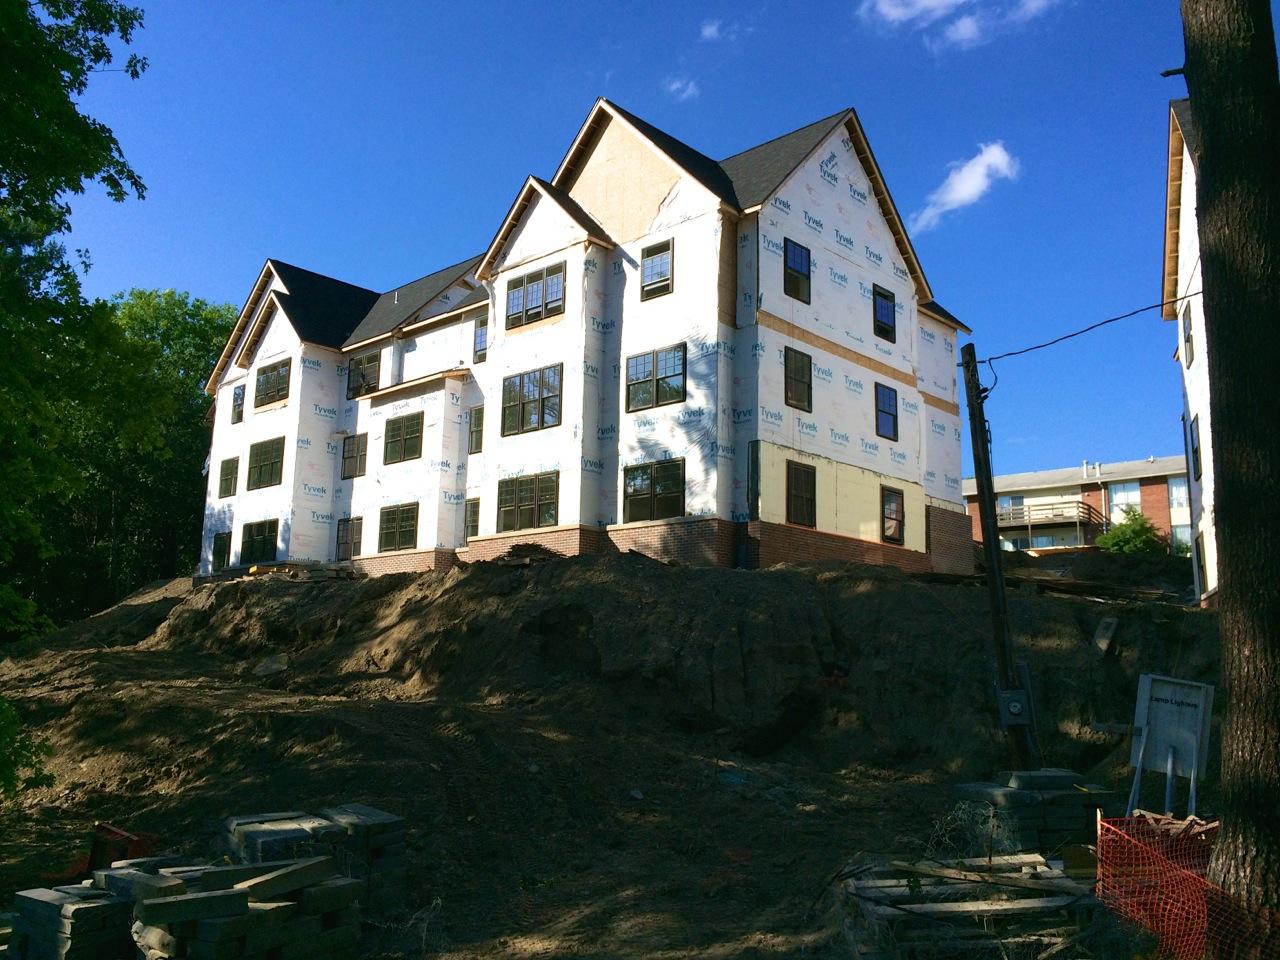 Thurston-Ave-Apartments-Ithaca-07021406